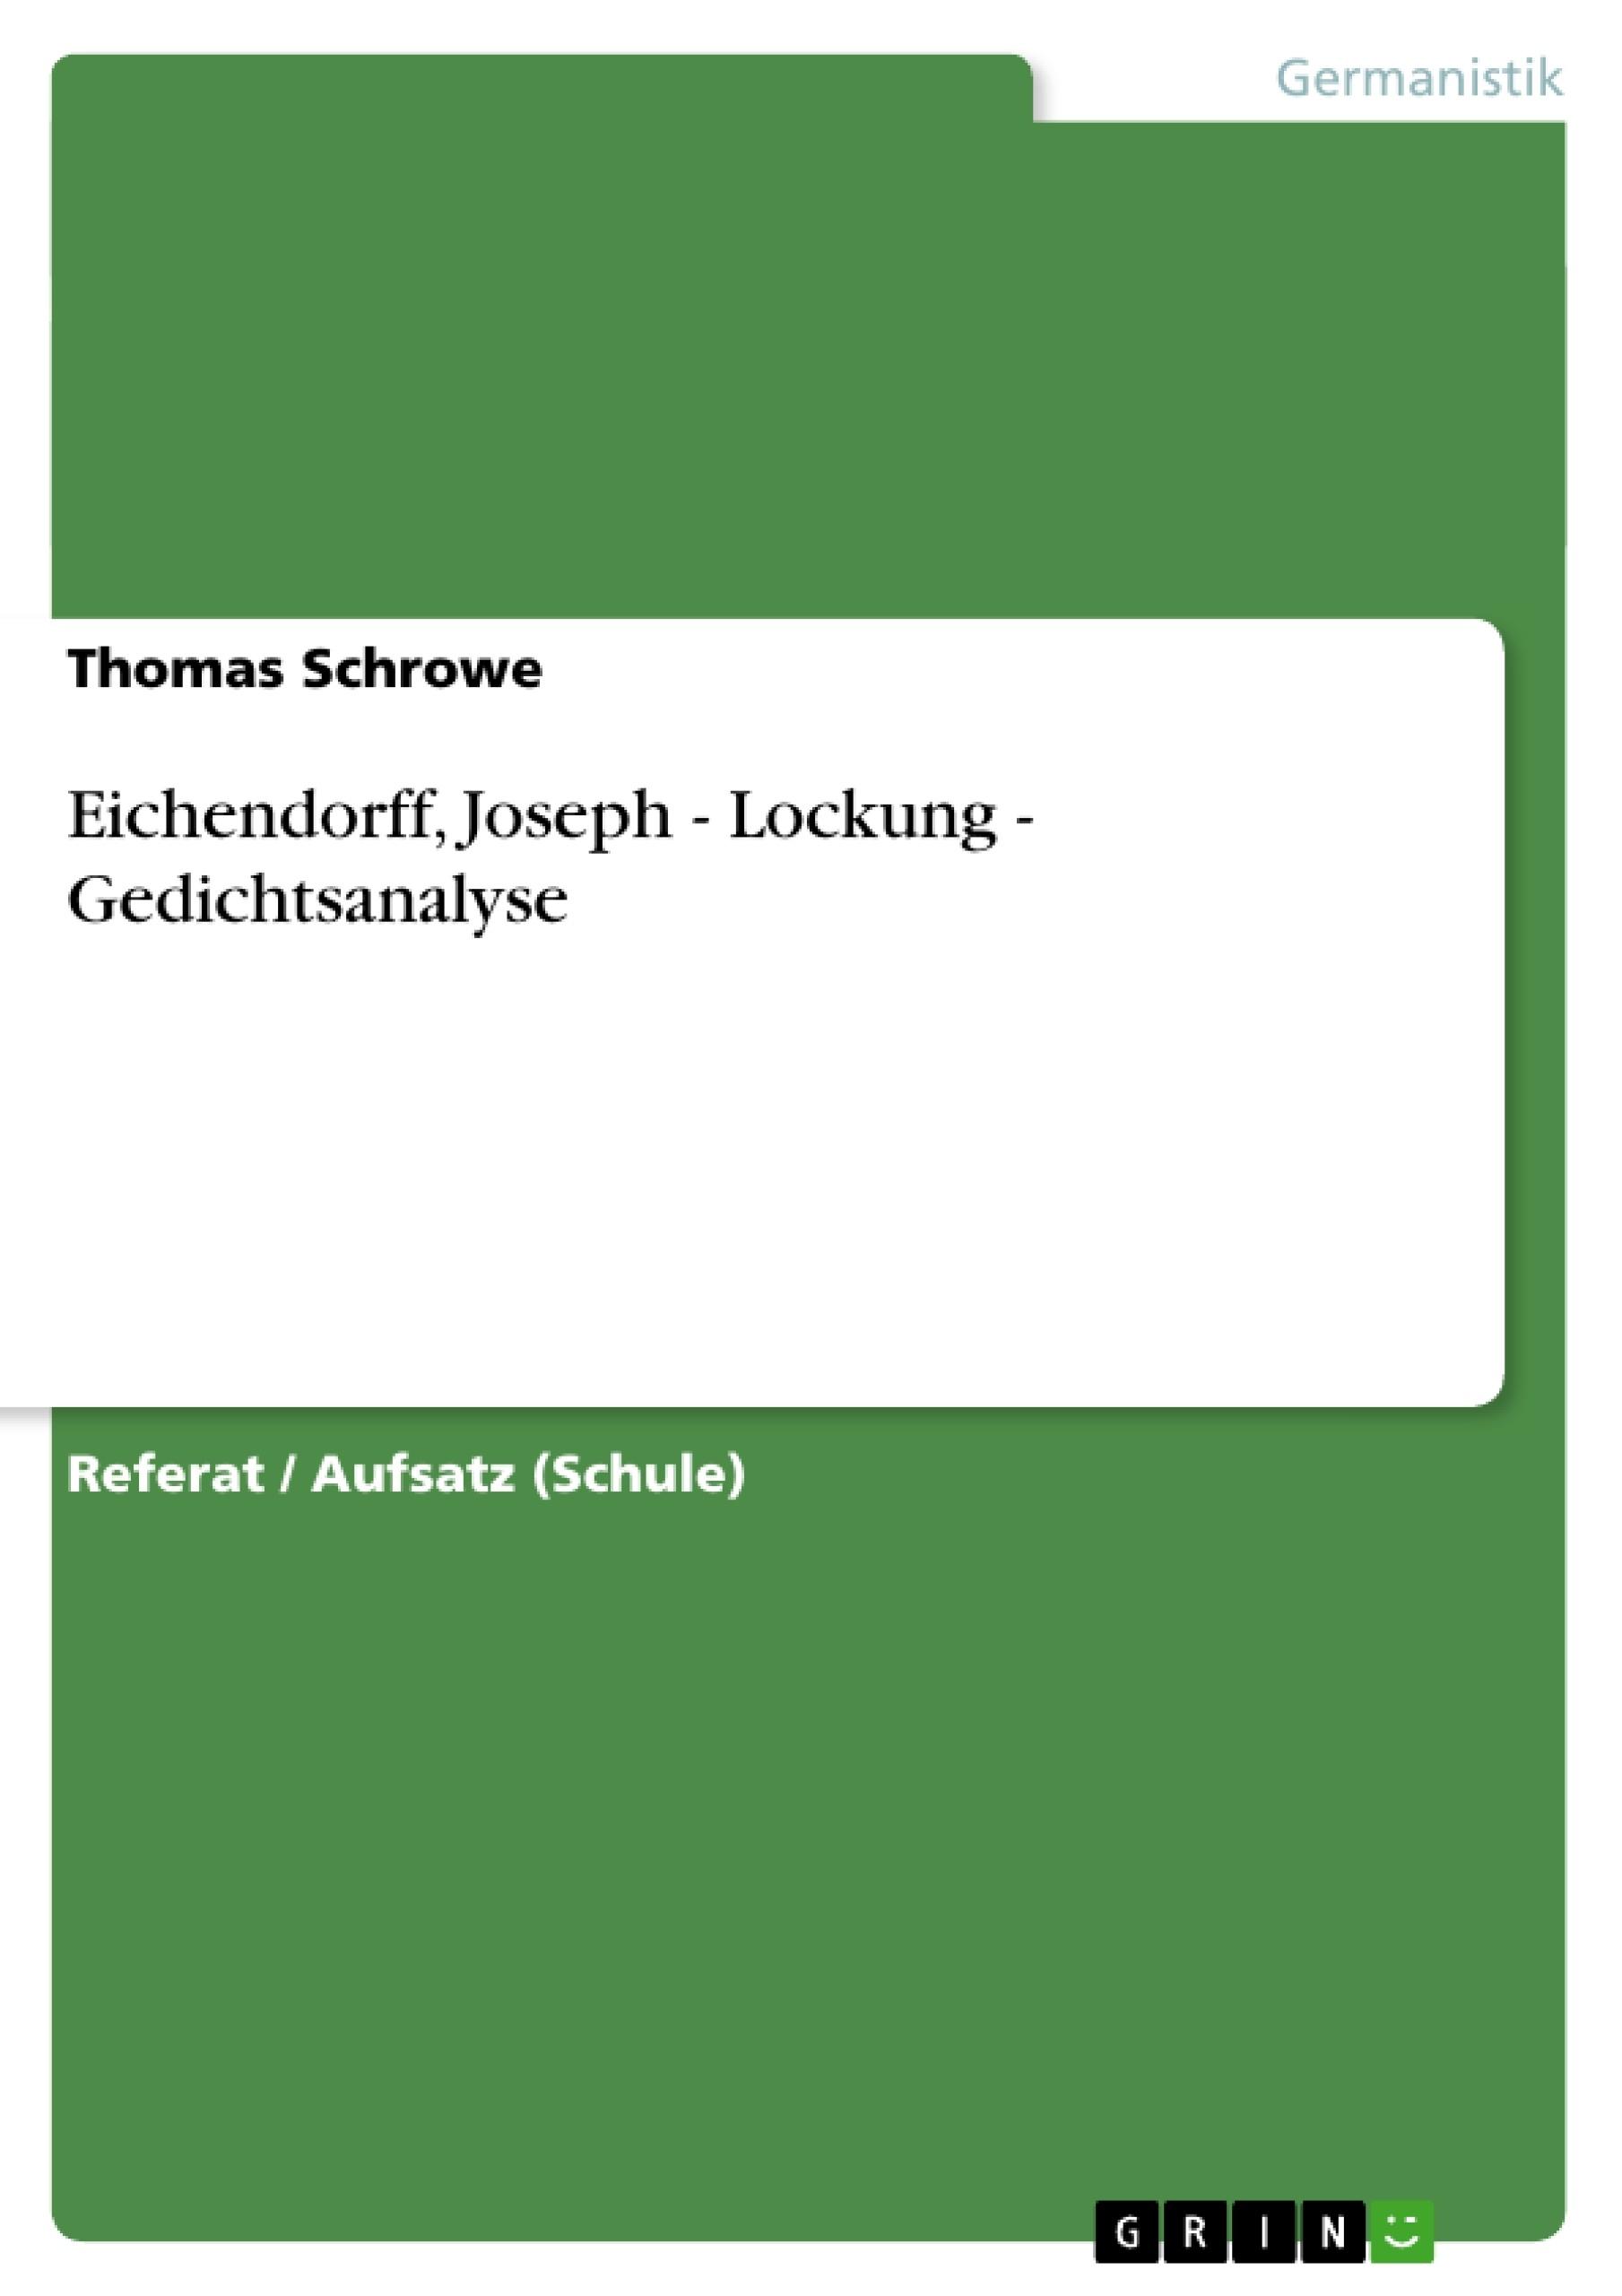 Titel: Eichendorff, Joseph - Lockung - Gedichtsanalyse